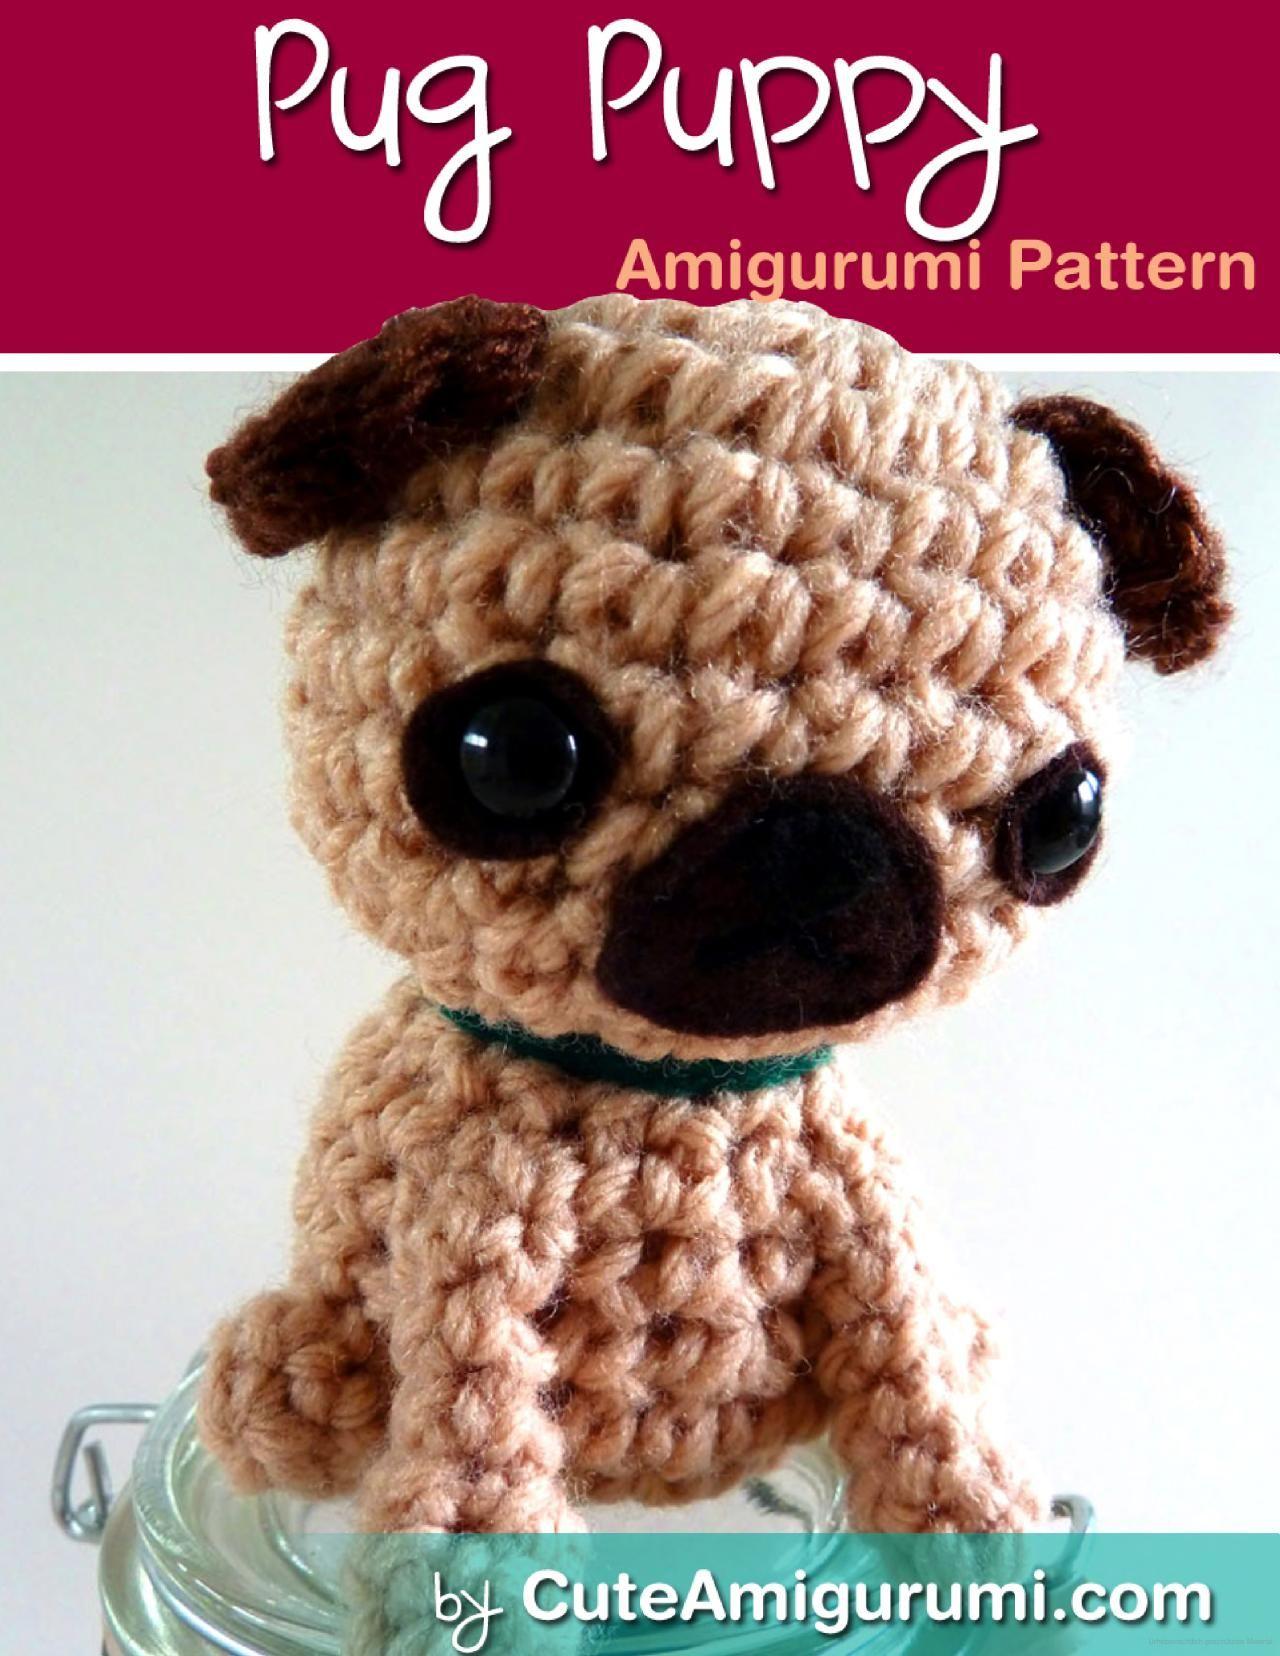 Pug Puppy Amigurumi Pattern [CuteAmigurumi.com]   Möpse   Pinterest ...